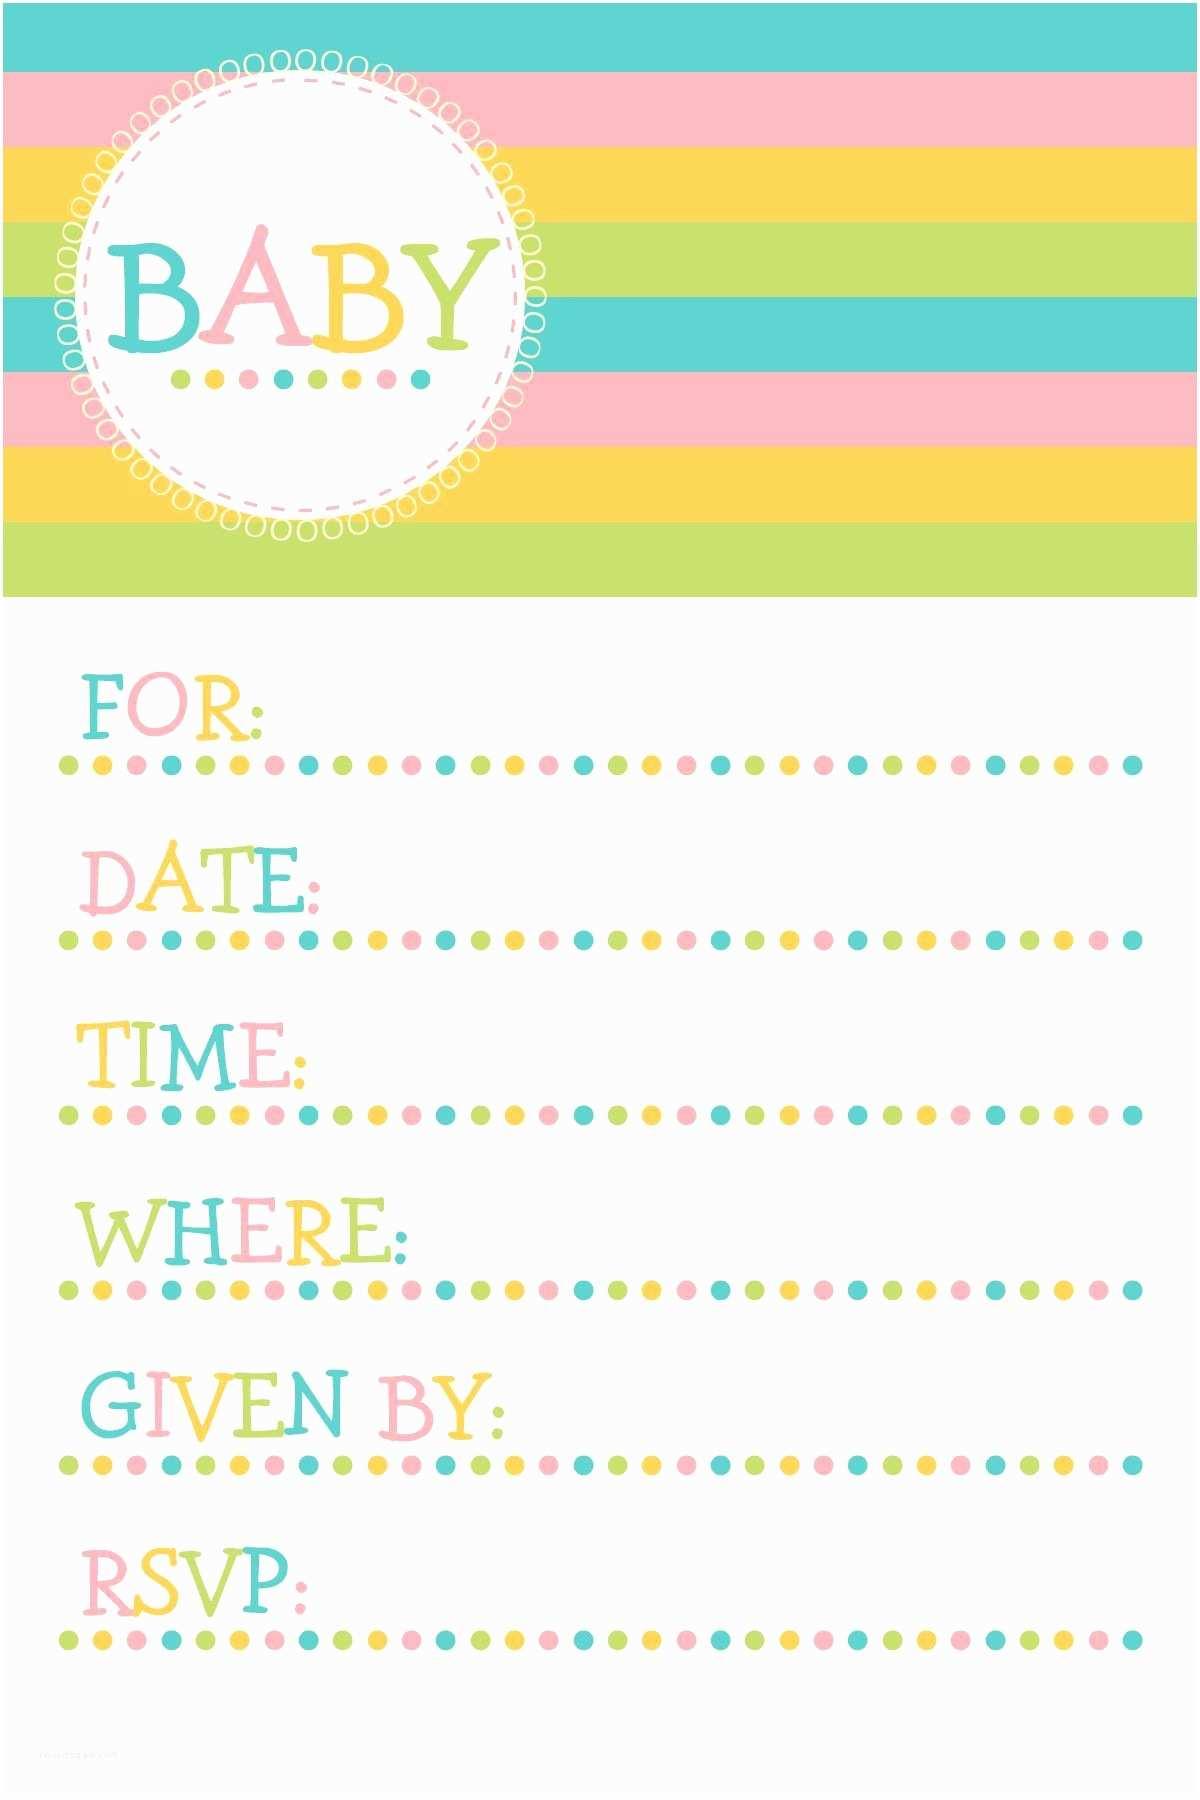 Free Baby  Invitation Free Baby Invitation Template Free Baby